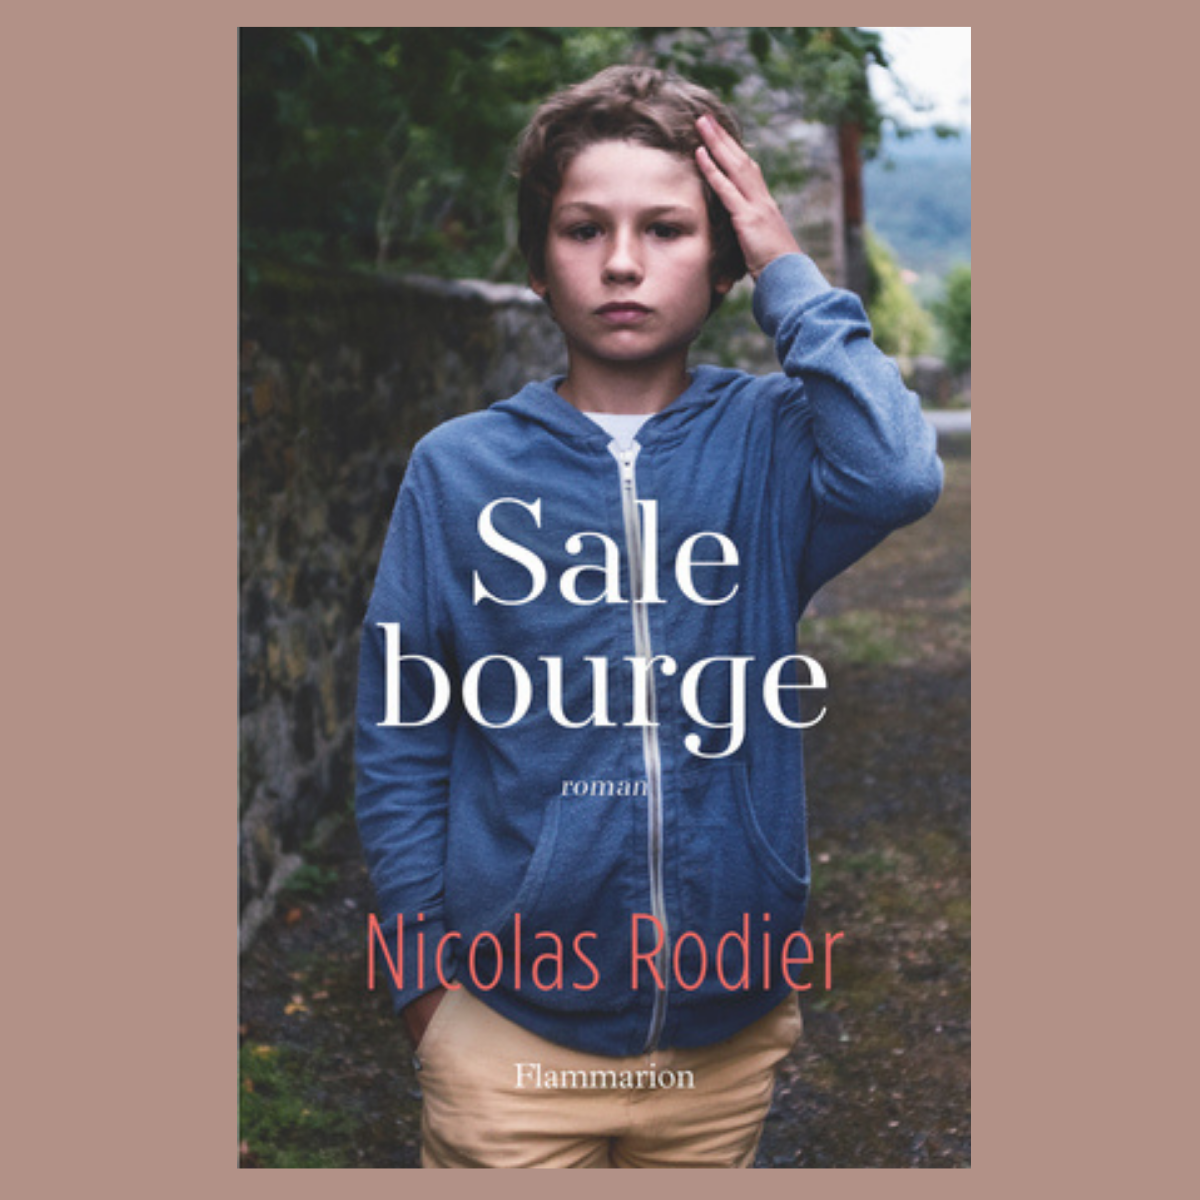 Sale Bourge - Nicolas Rodier (Flammarion)